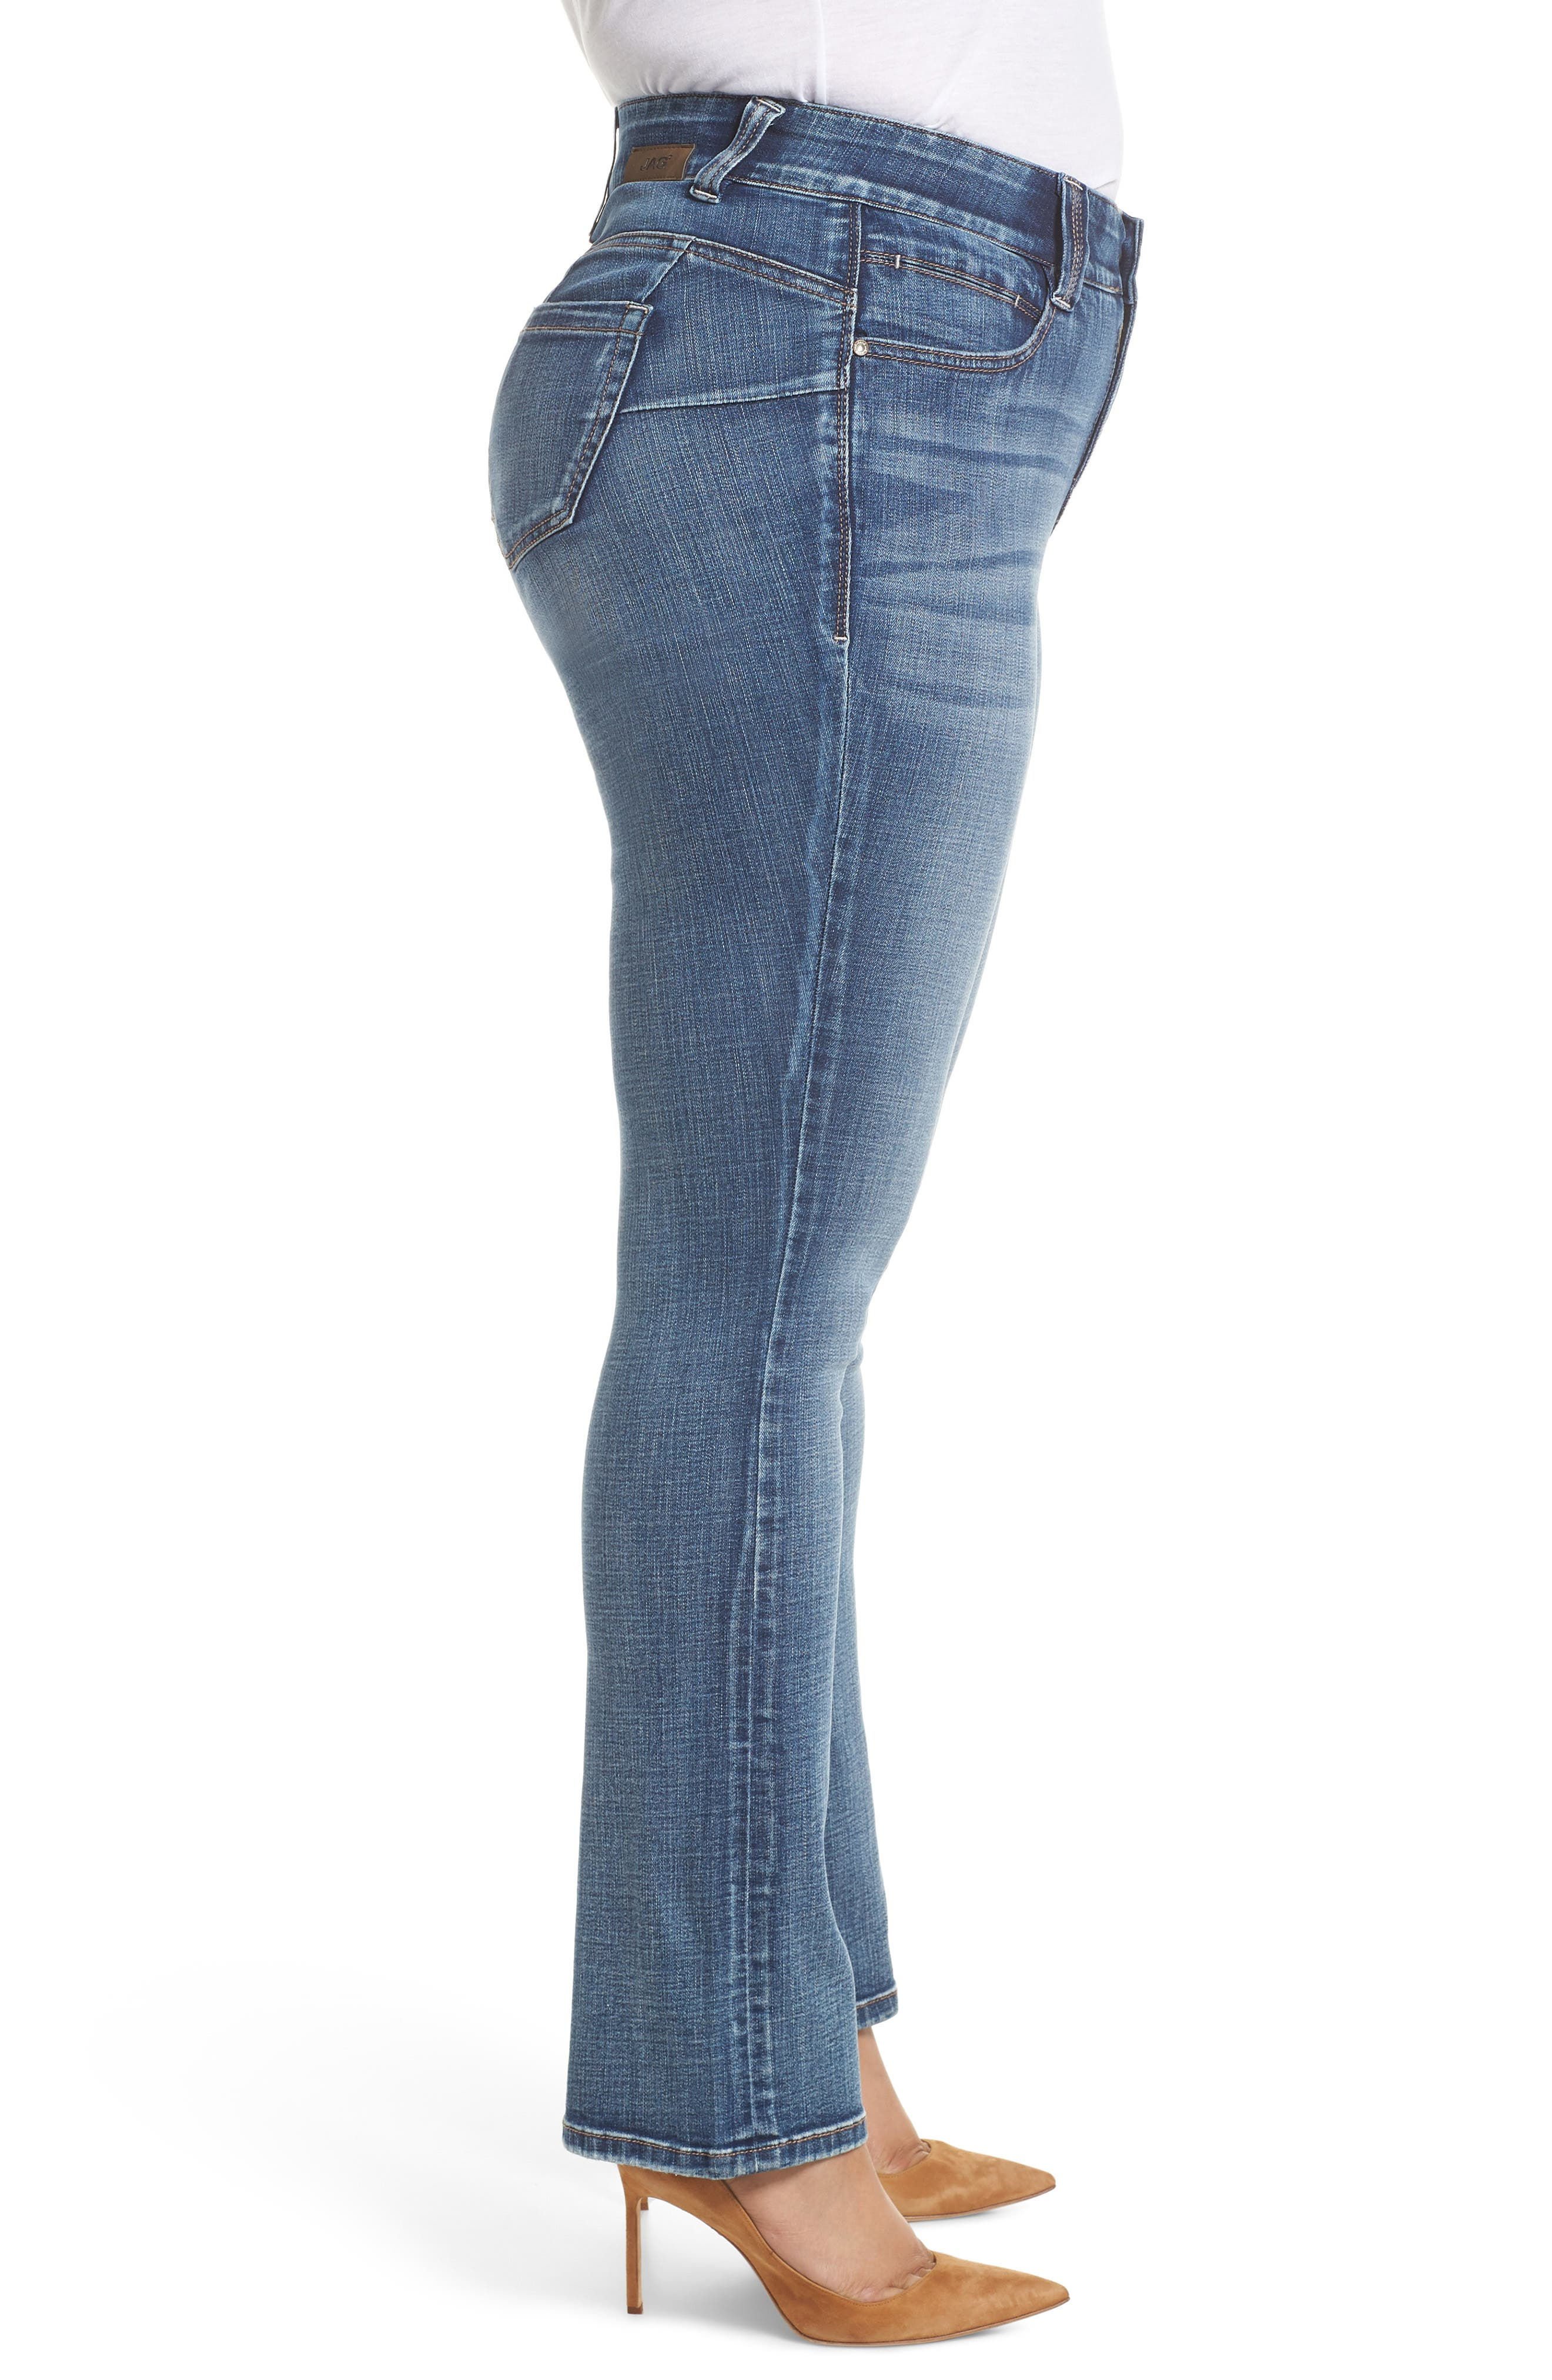 JAG JEANS, Eloise Bootcut Stretch Jeans, Alternate thumbnail 4, color, MED INDIGO